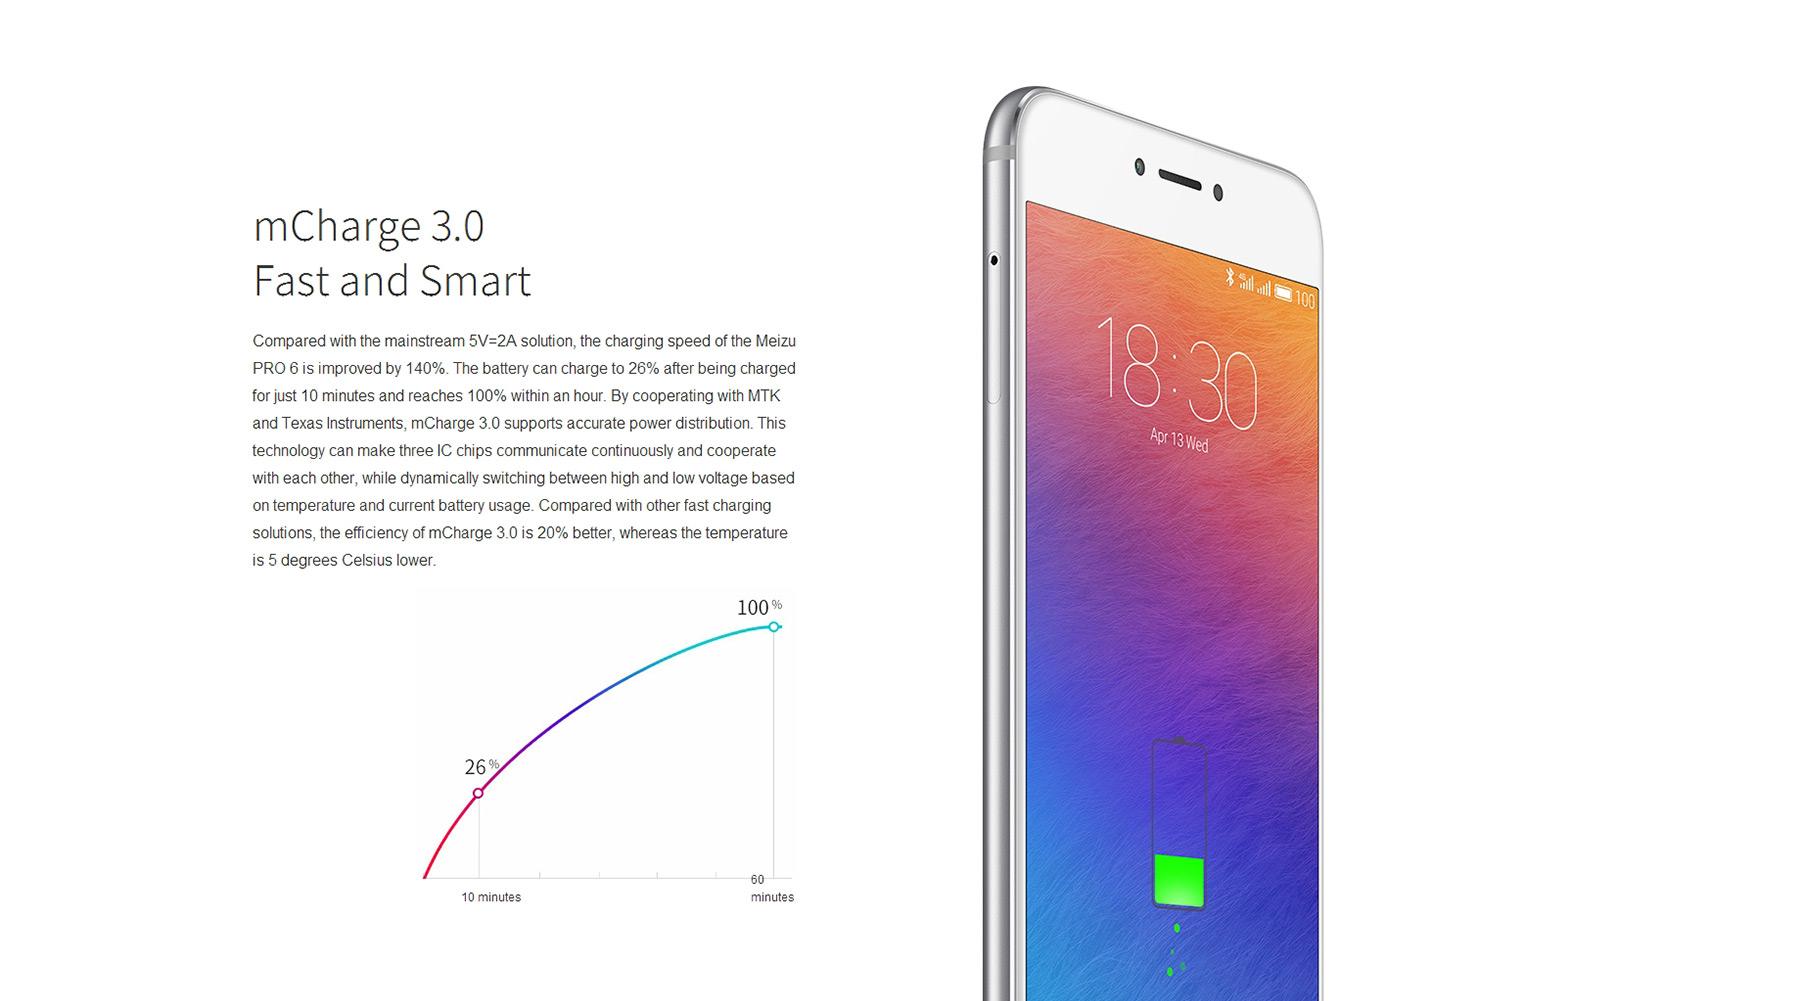 Meizu PRO 6, Antutu, China Handy Neu, China Smartphone, Neuheit, bester Preis, Gearbest